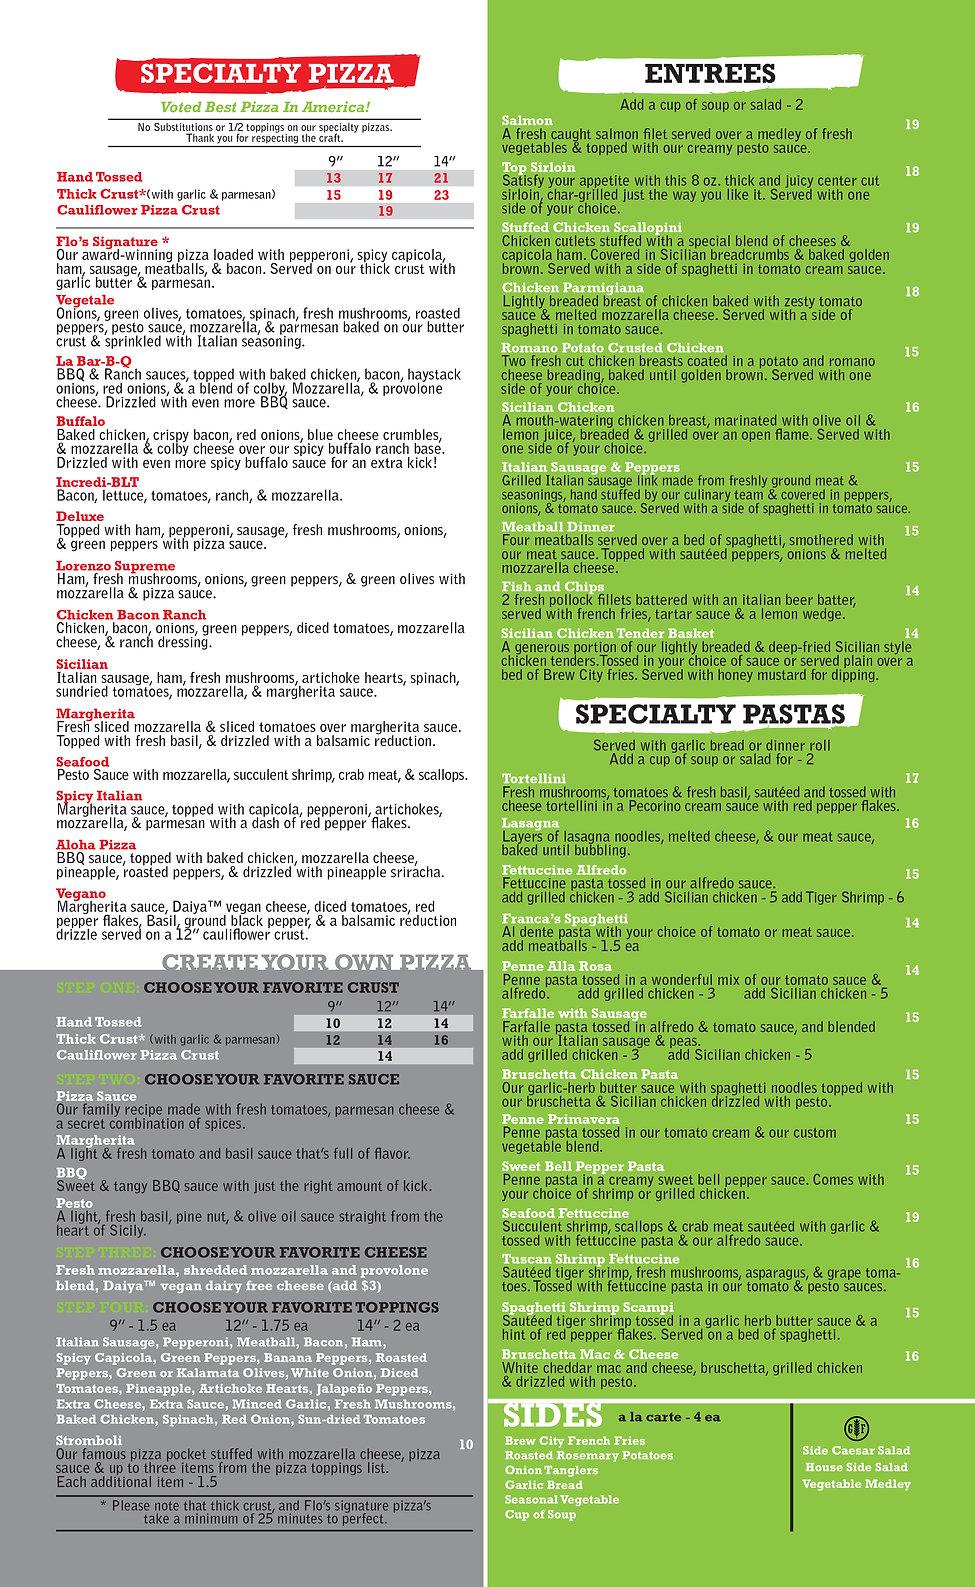 Flo's Sports Bar Menu 092920 (1)-2.jpg